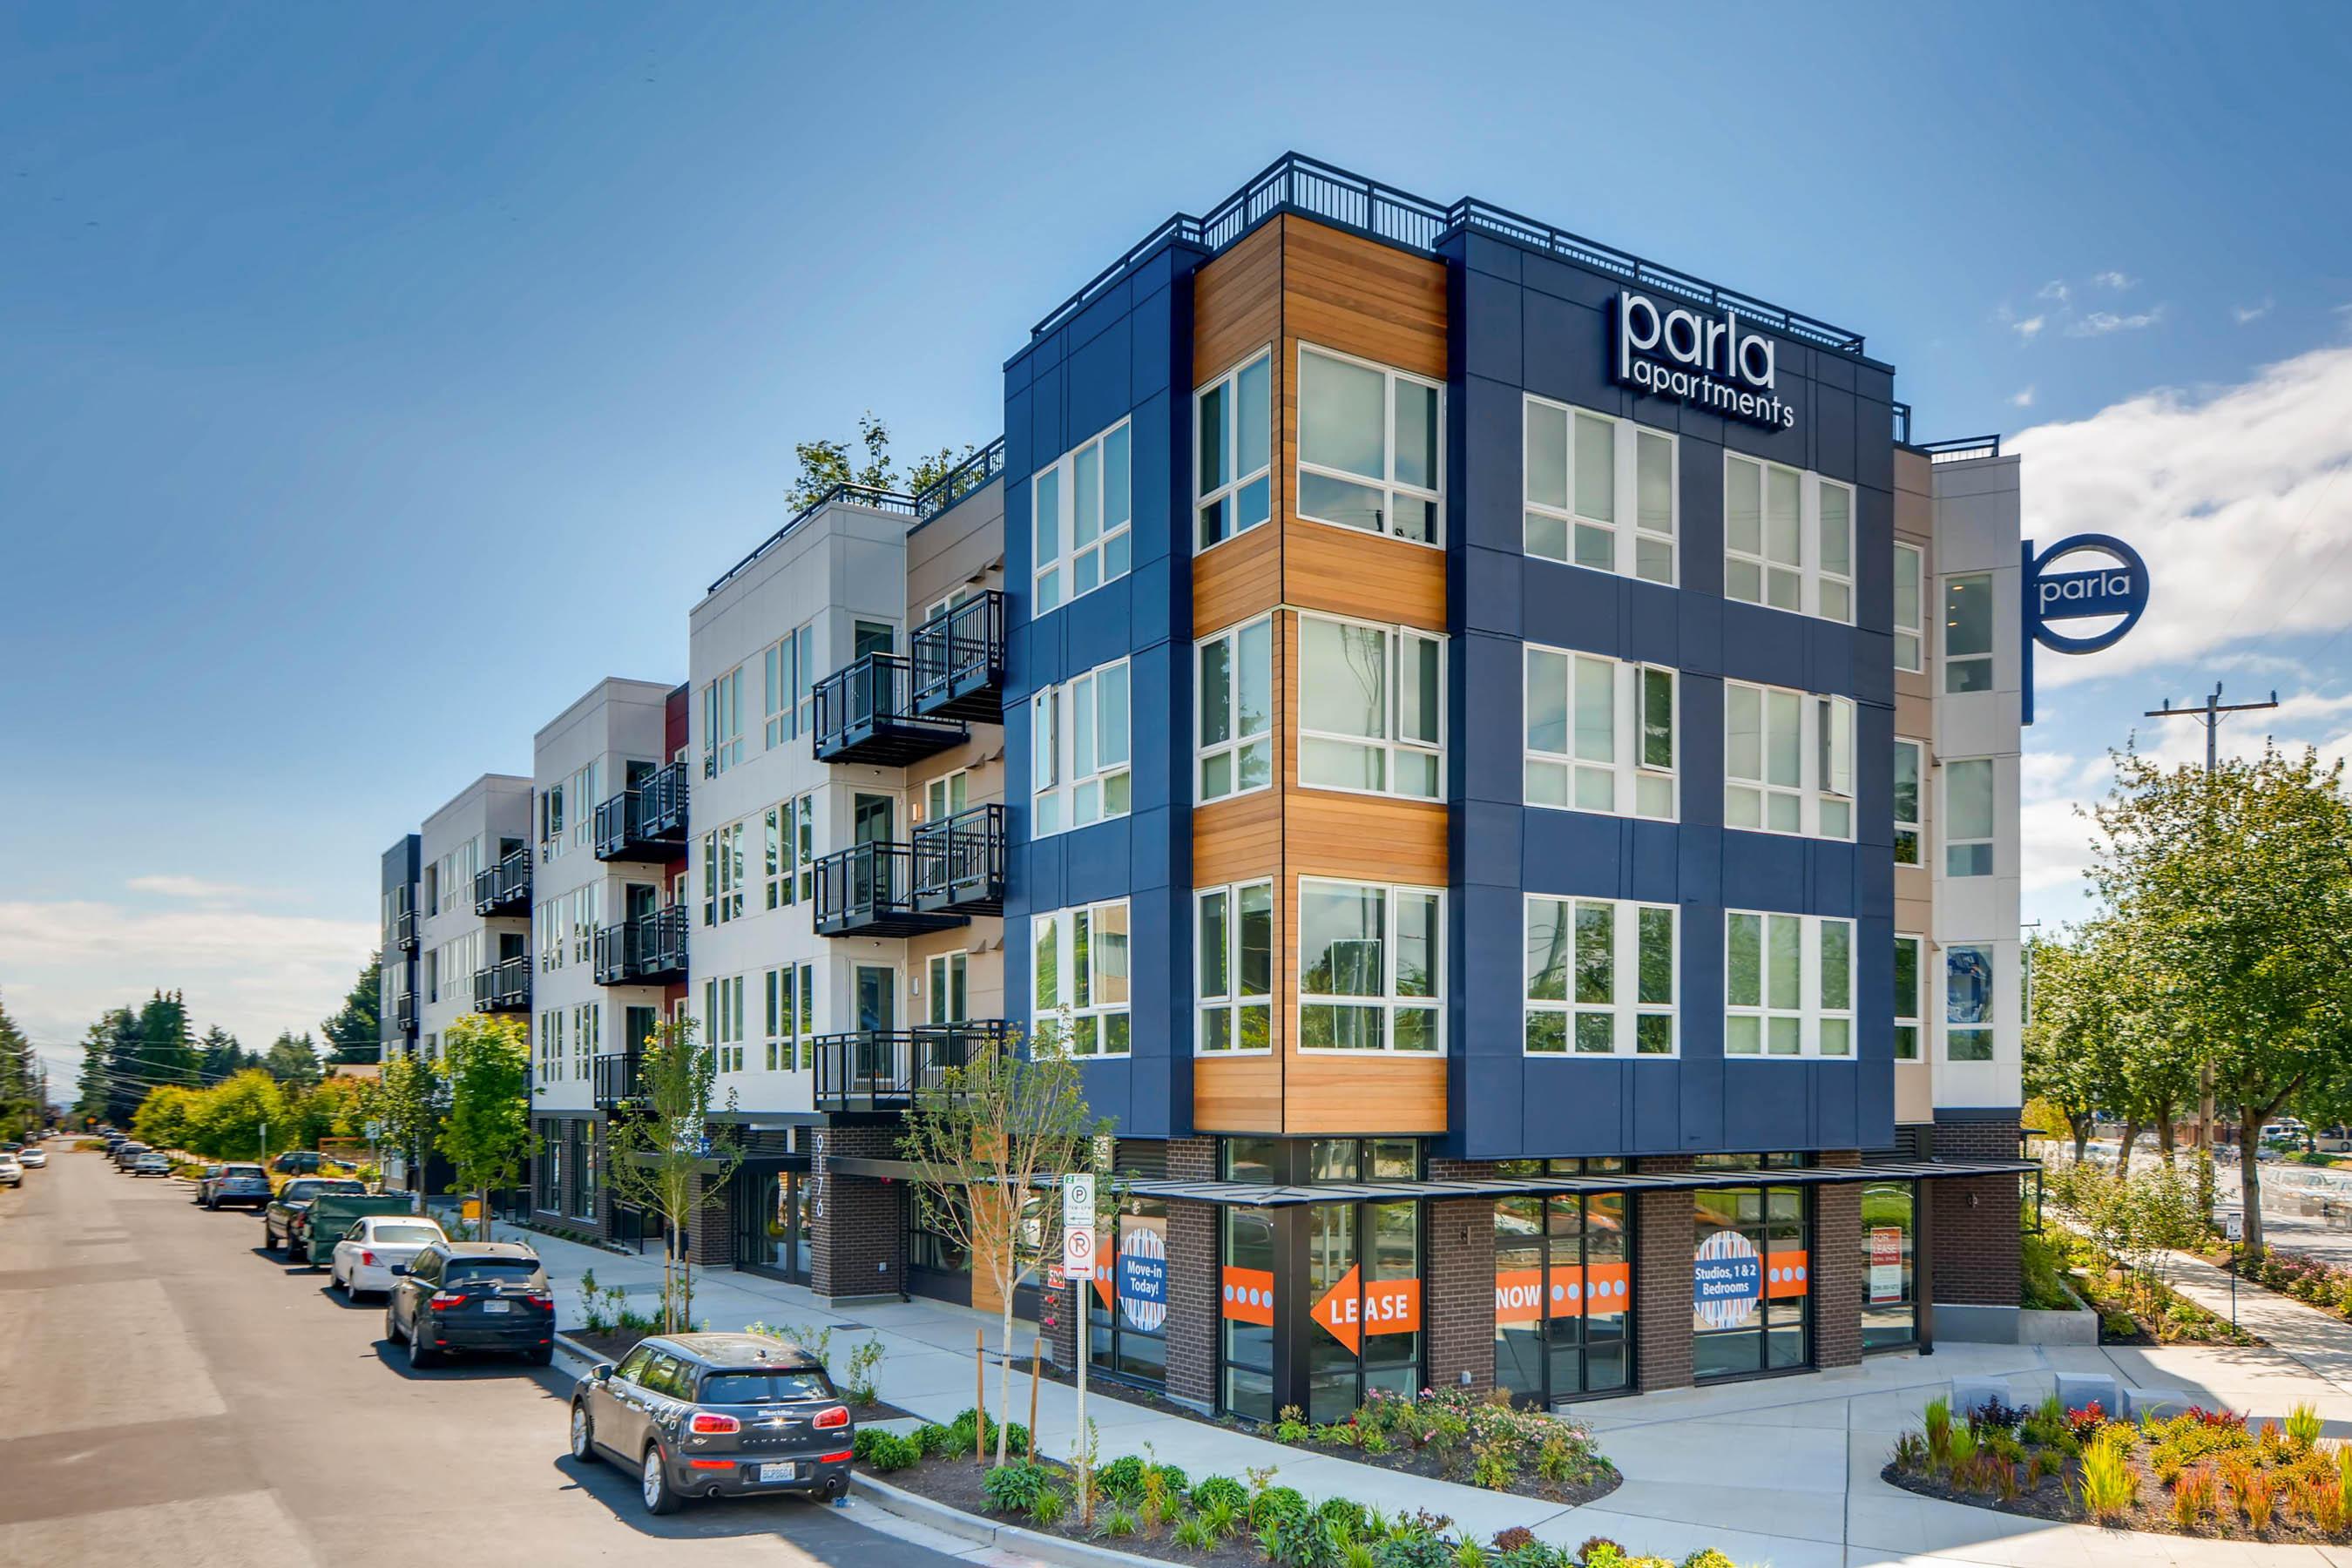 Parla Apartments image 8